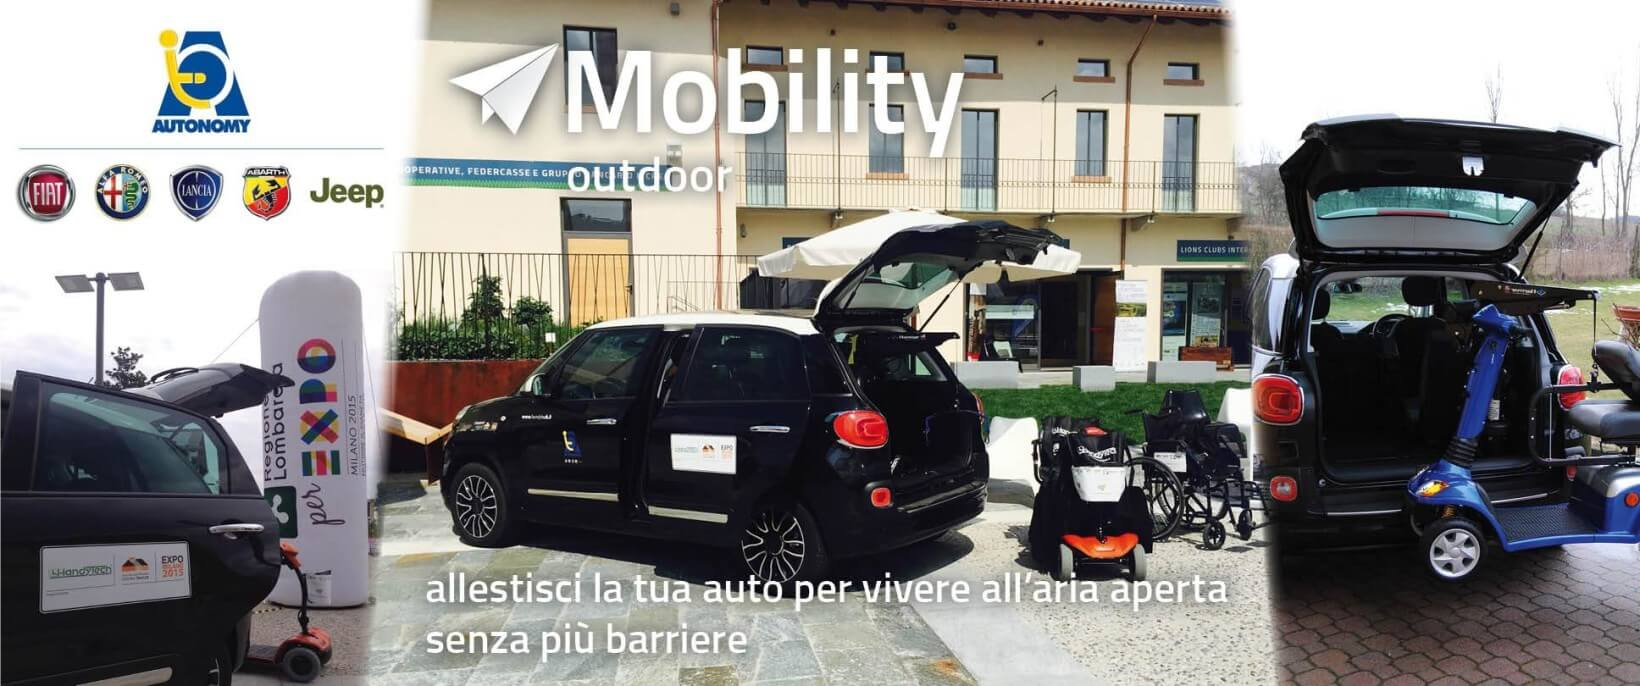 allestimento-veicoli-fiat-autonomy-per-disabili